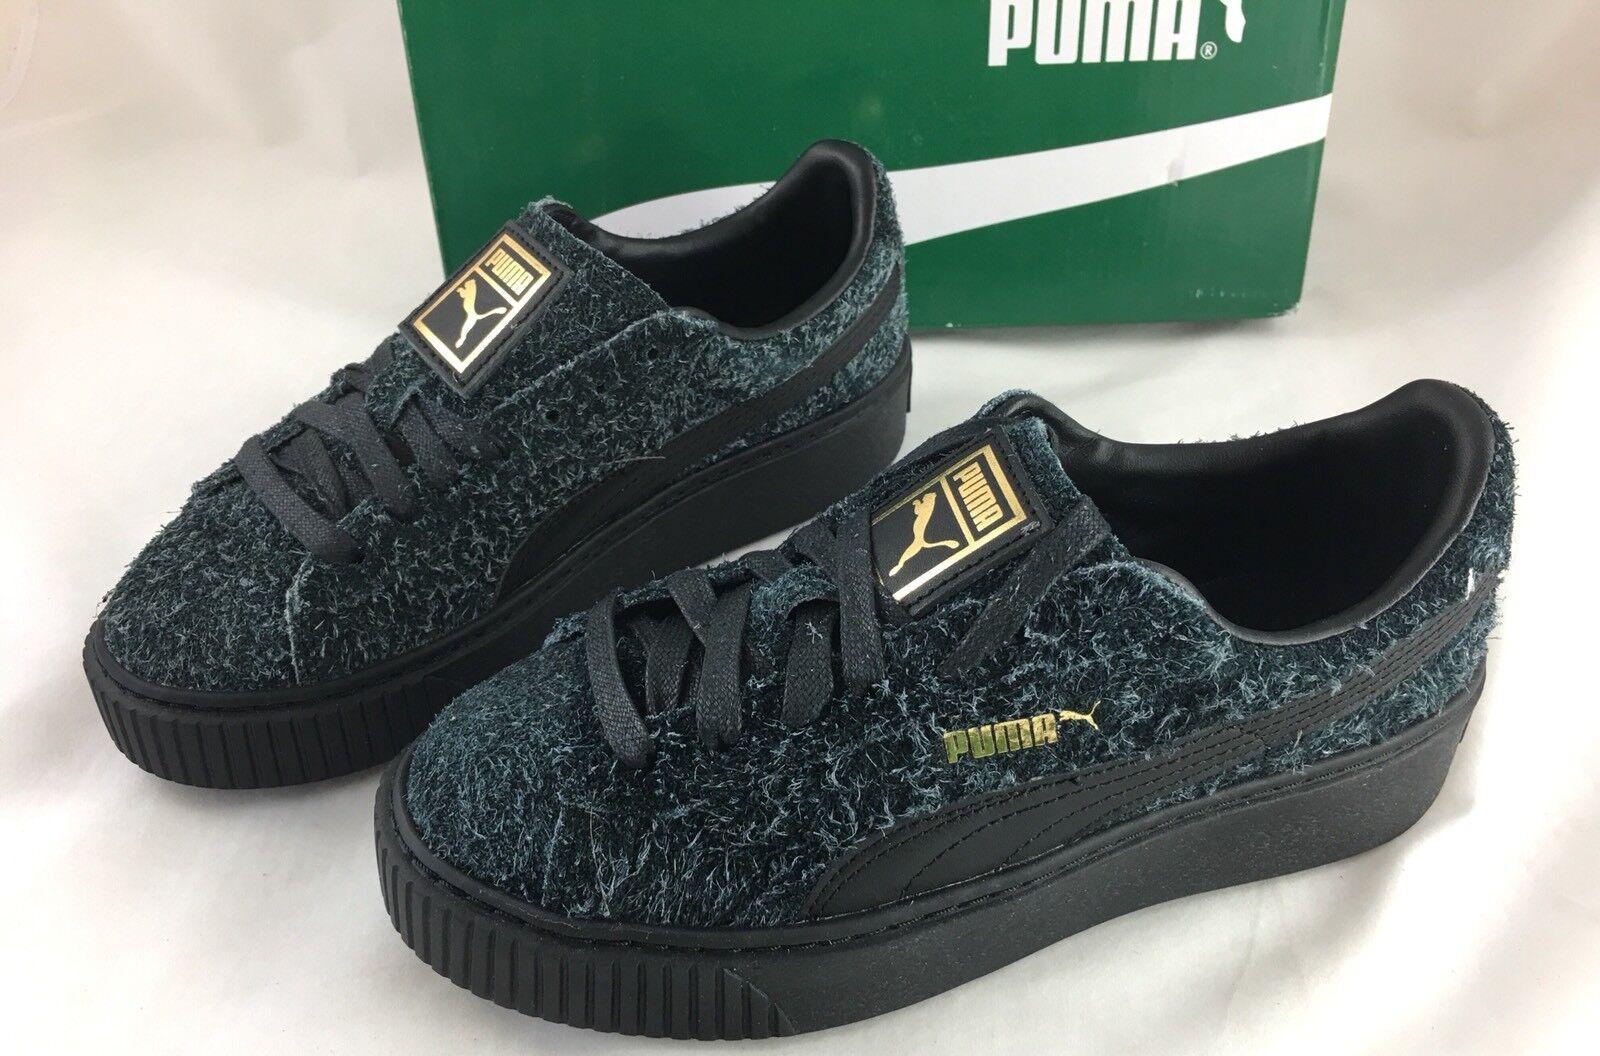 PUMA Womens Womens Womens Winterized Fuzzy Suede Platform Elemental Casual Sneaker Size 6 5c0e82